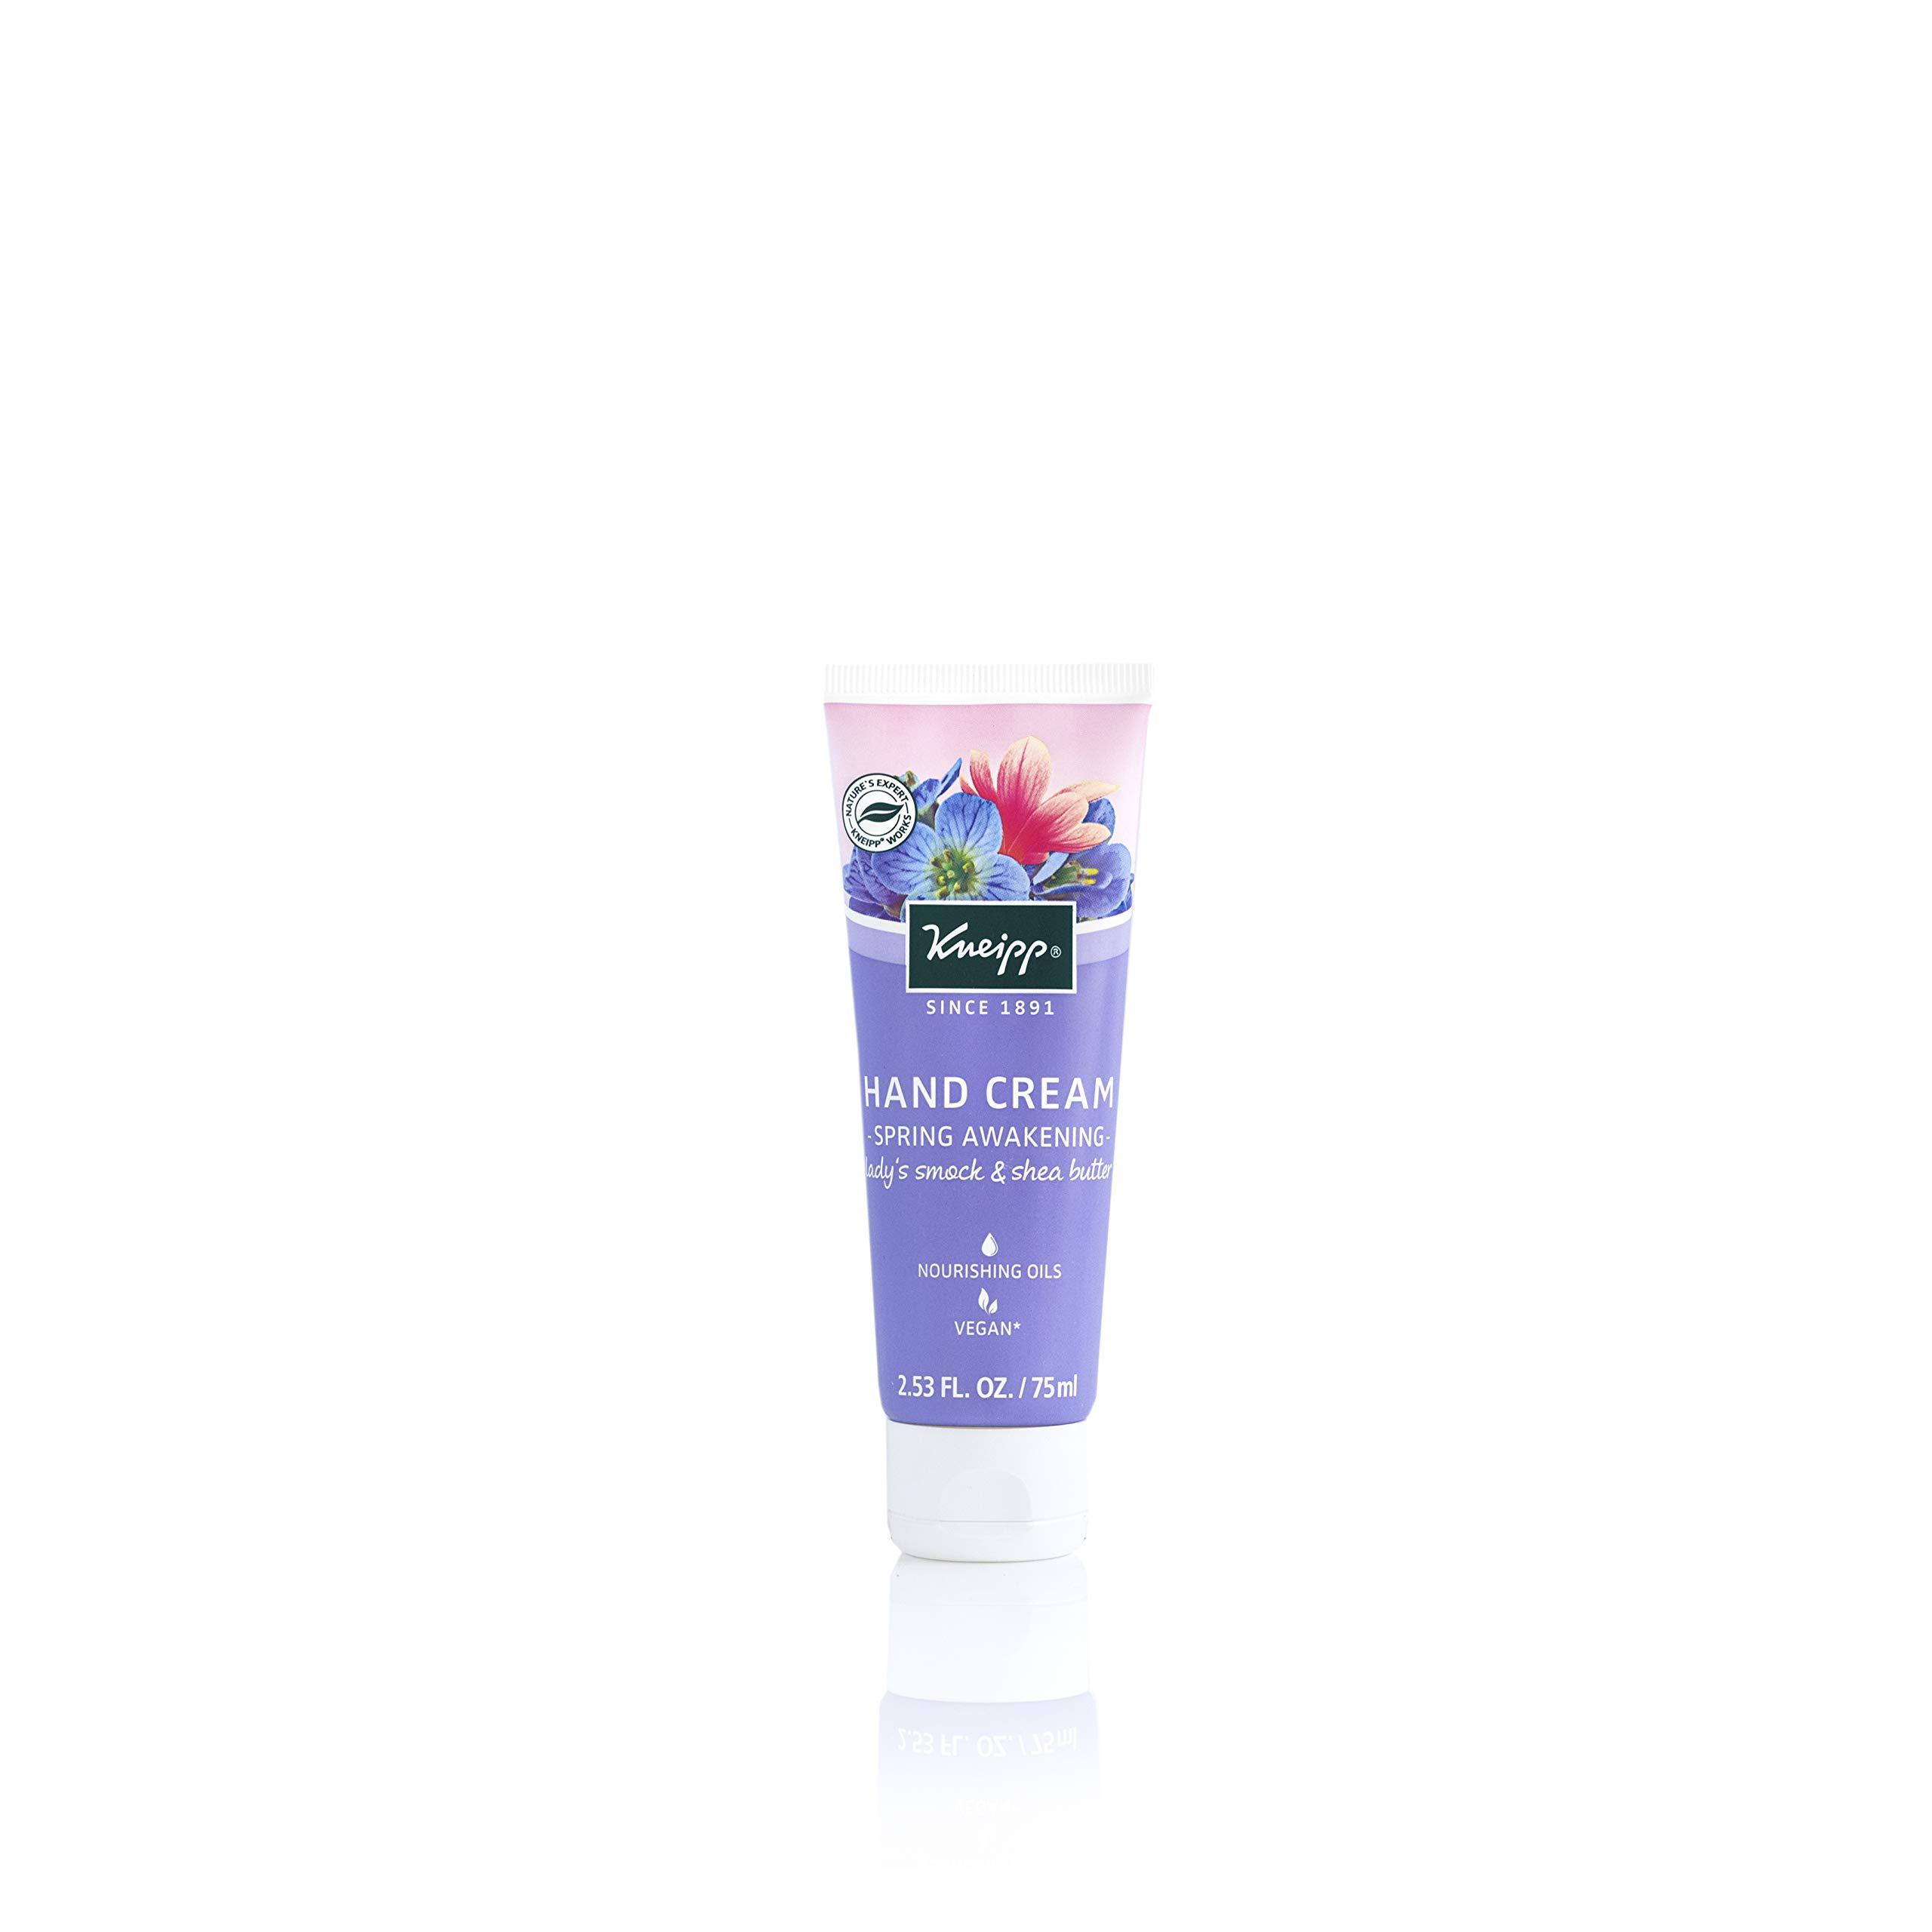 Kneipp Hand Cream, Lady's Smock & Shea Butter - 2.53 fl. Oz.